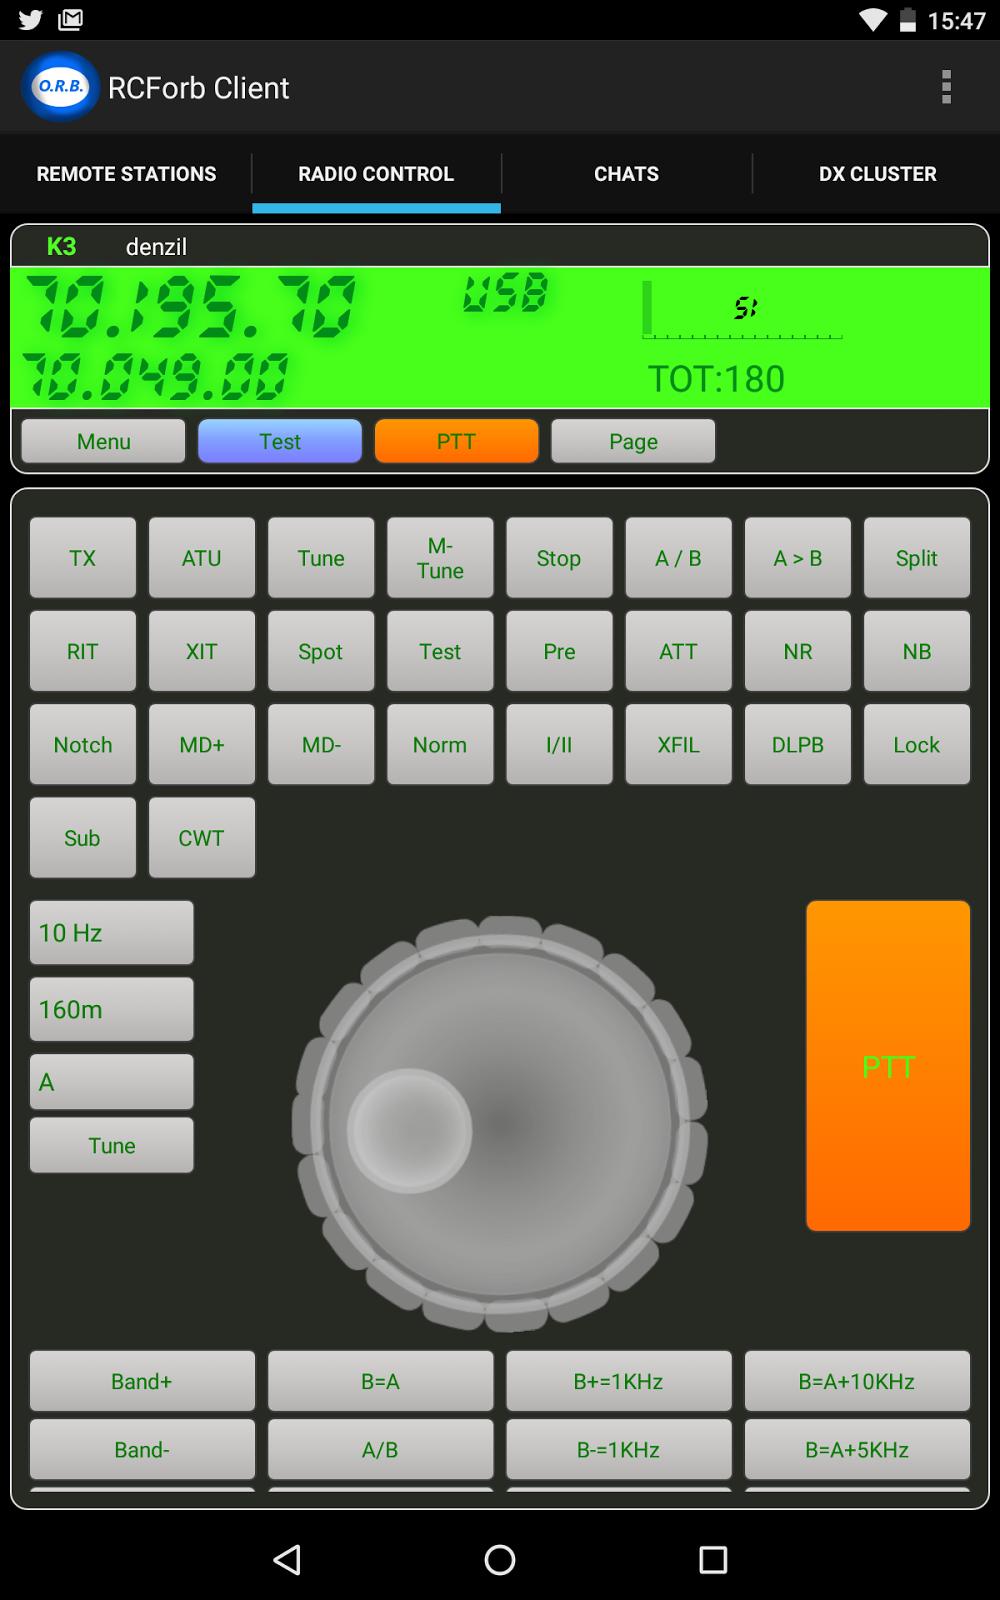 G4FRE RADIO BLOG: Using RCFOrb On a Nexus 7